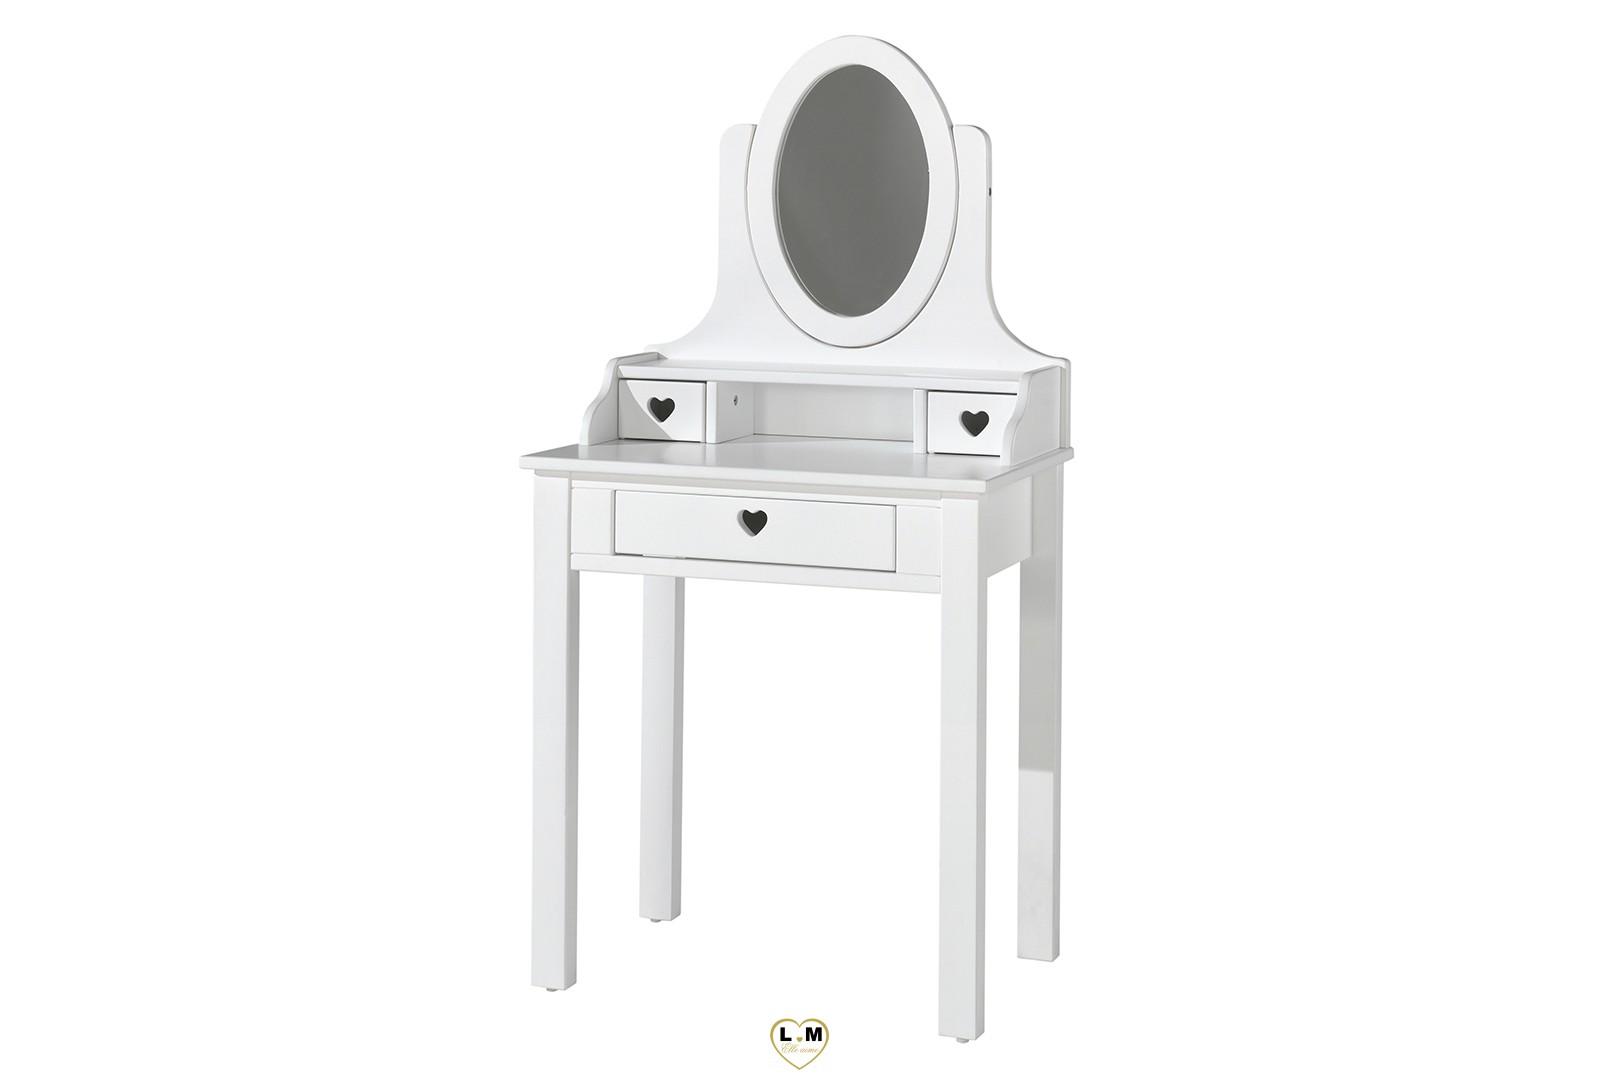 gallery of amour laqu blanc mat chambre enfant la coiffeuse tirioir credence avec miroir with. Black Bedroom Furniture Sets. Home Design Ideas